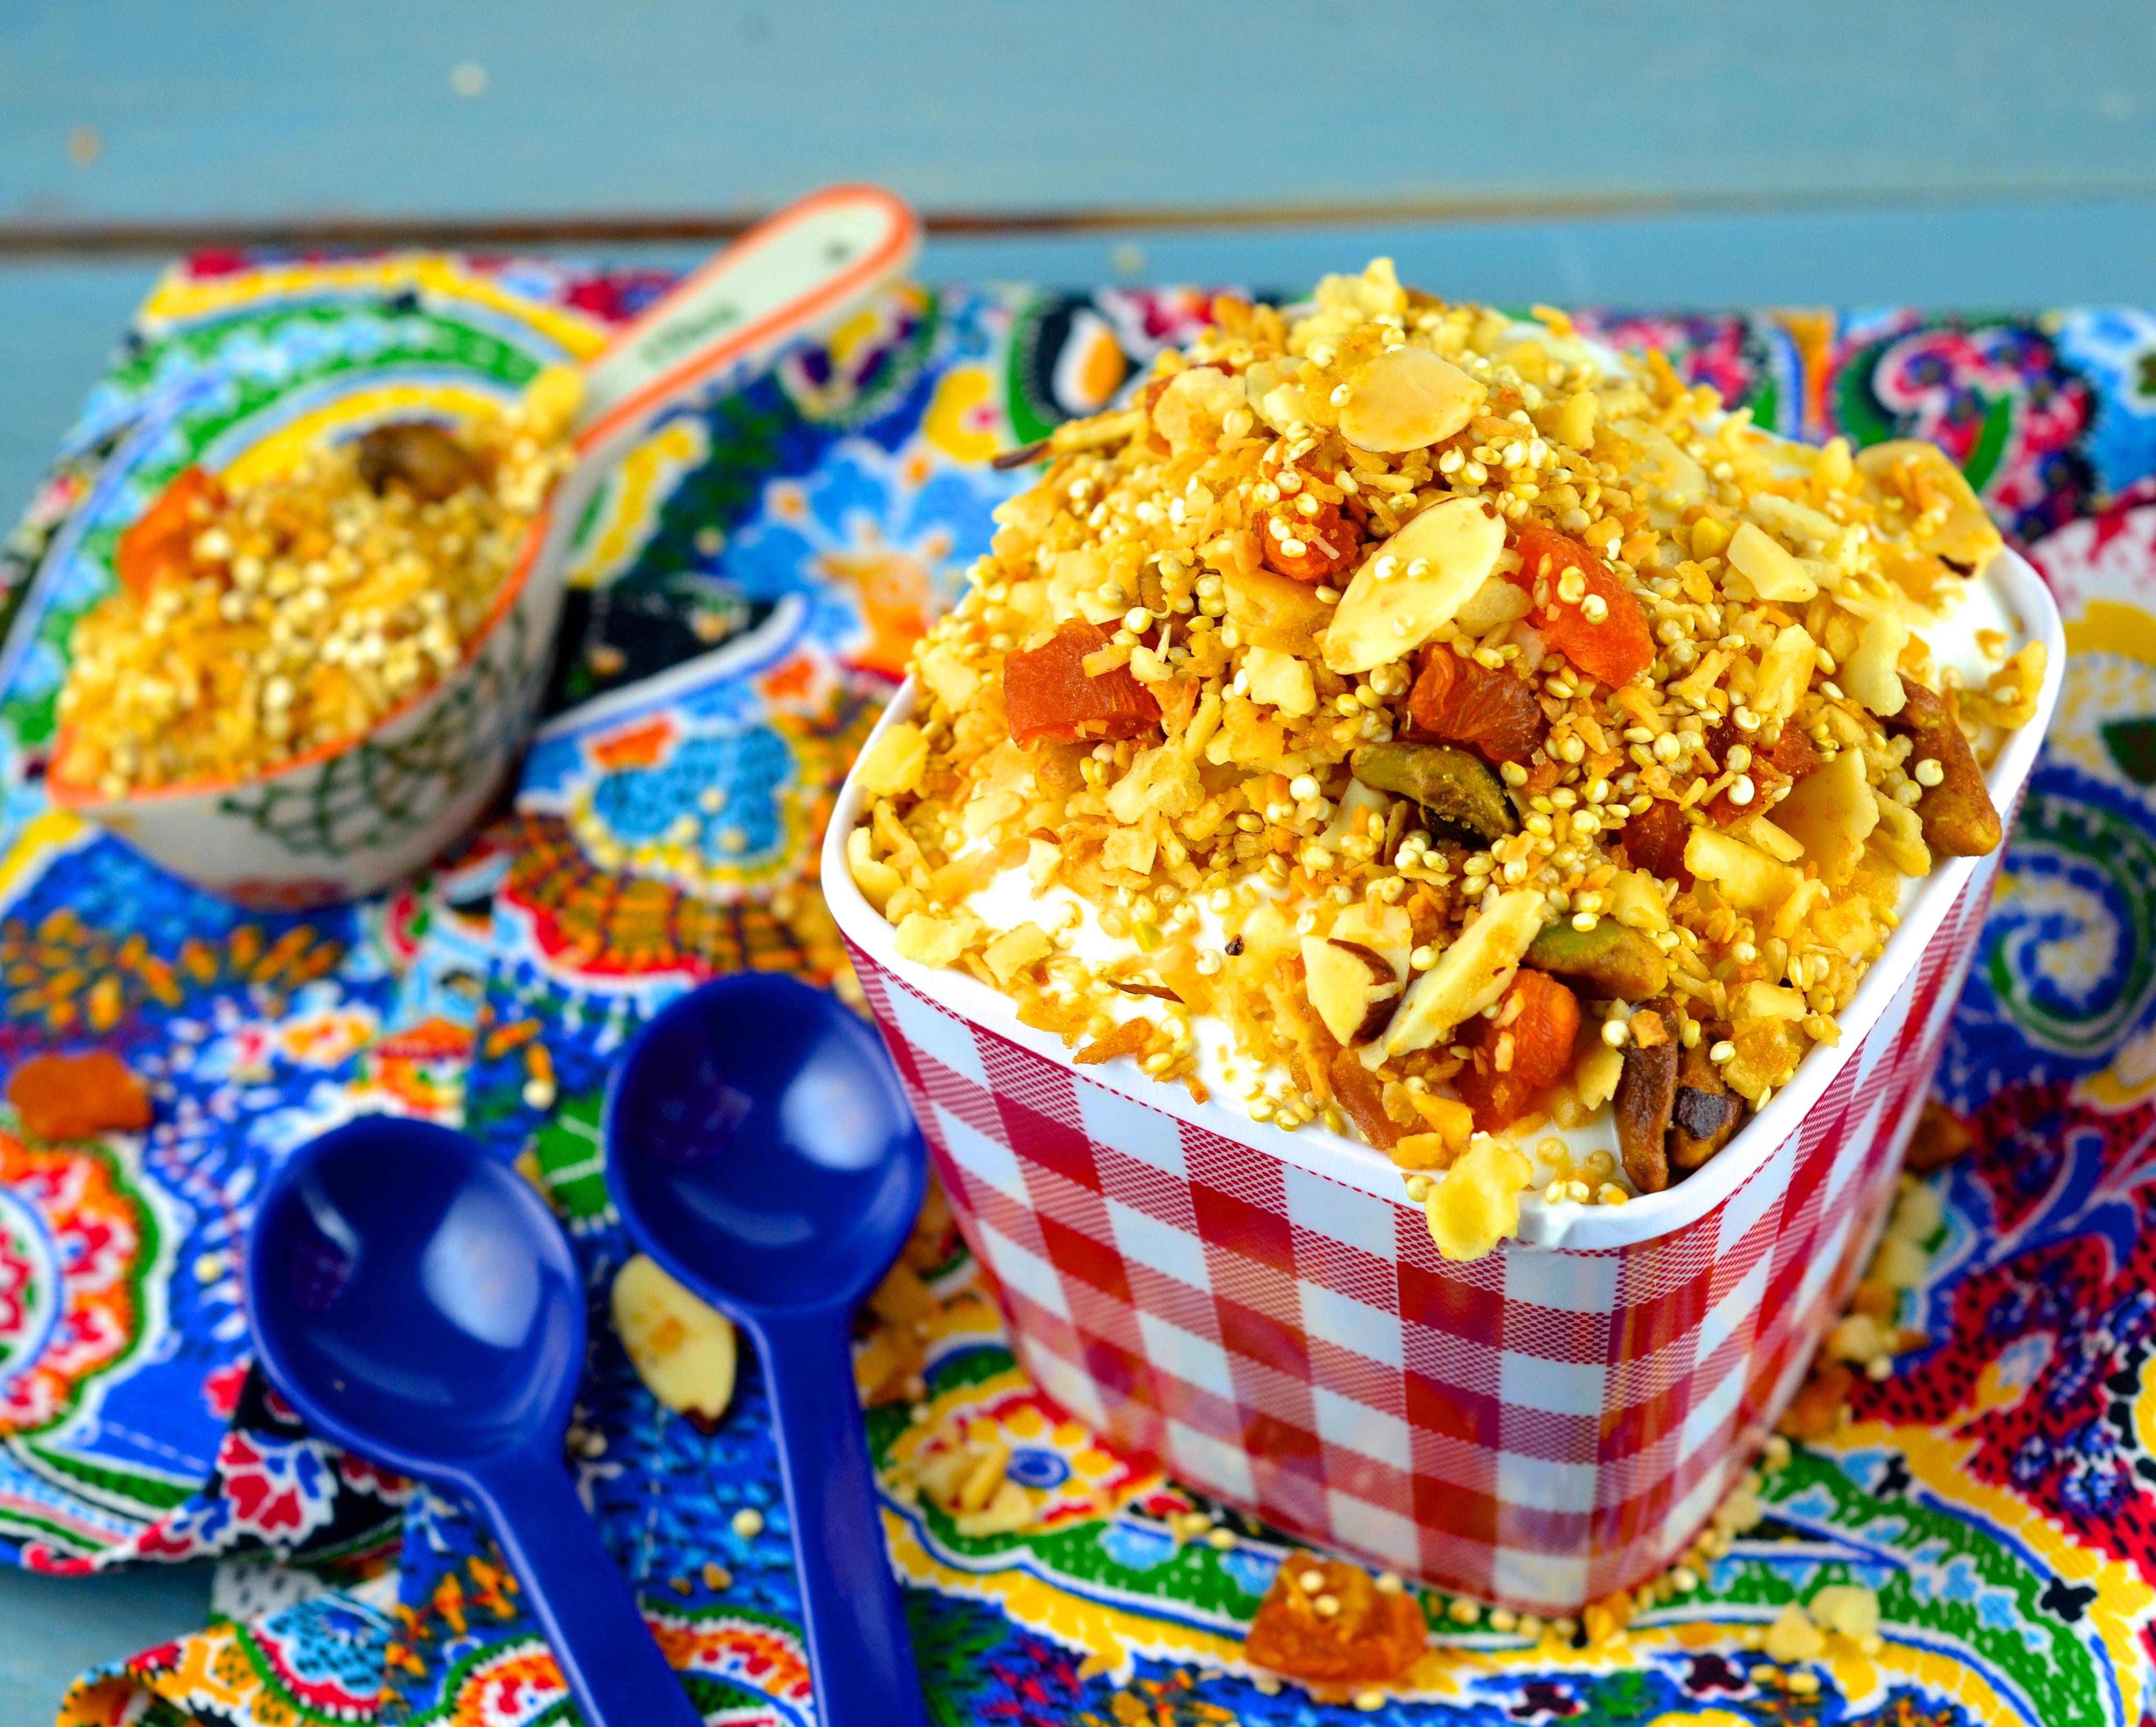 Gluten Free Passover Recipes Part 5 : Quinoa, Pistachio & Apricot Granola